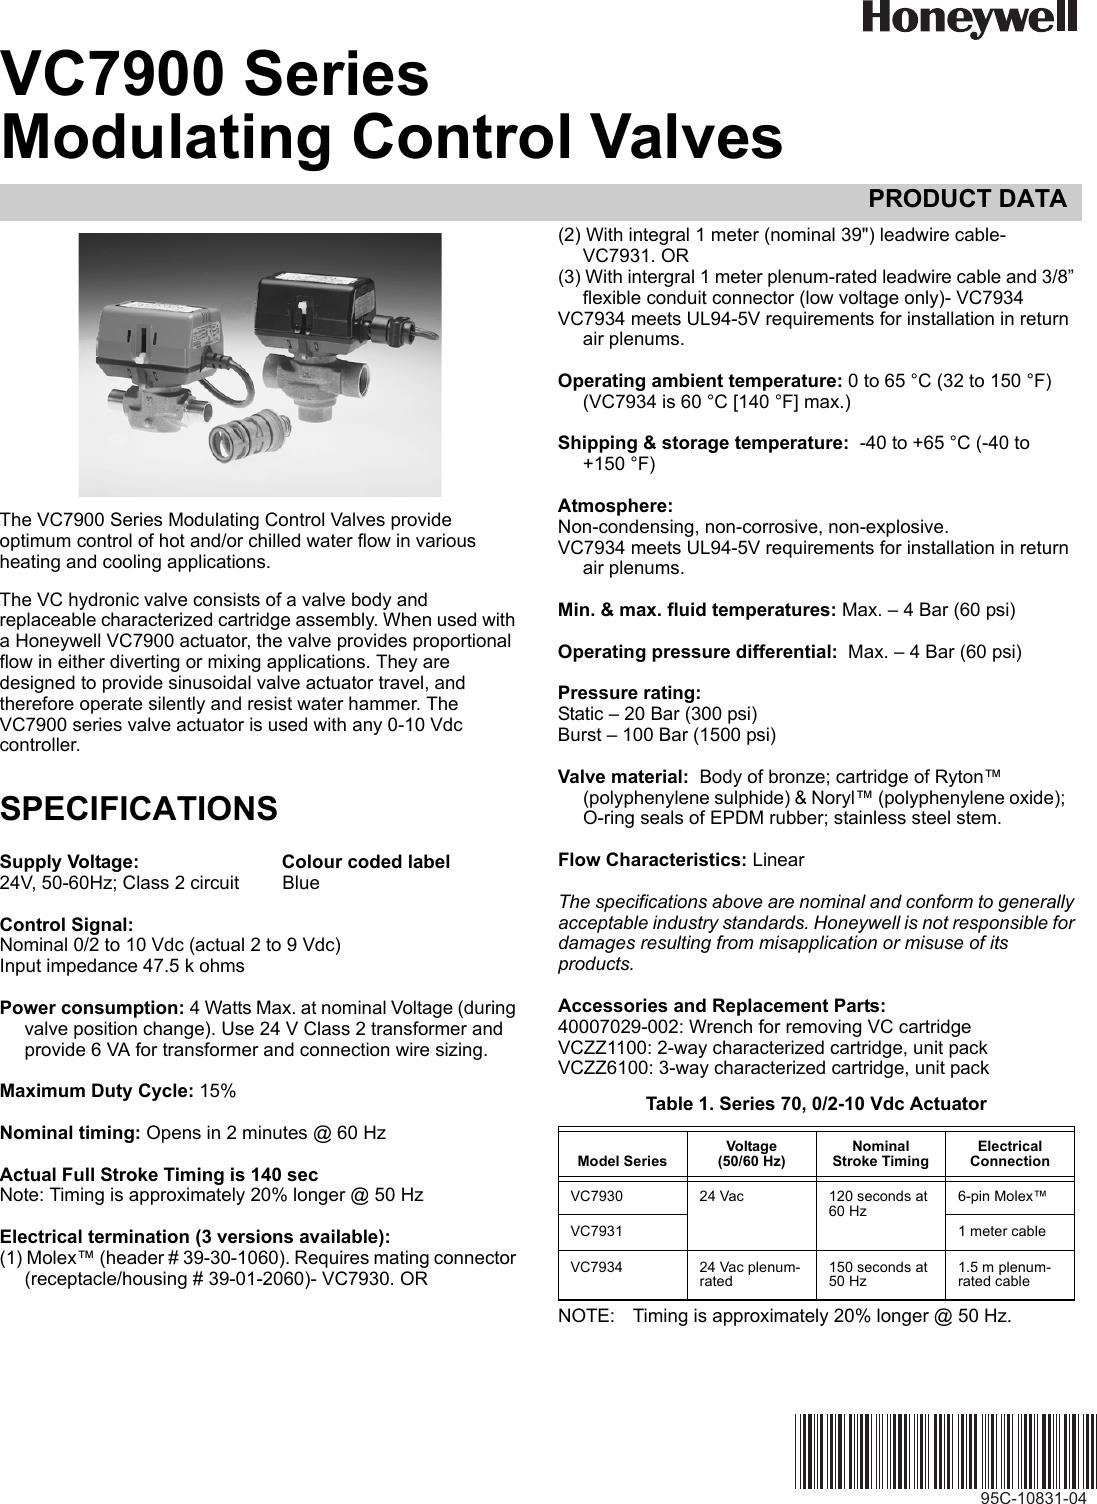 honeywell automobile parts vc7900 users manual 95c 10831 a series rh usermanual wiki Honeywell Pro 8000 Thermostat Manual Honeywell Pro 8000 Thermostat Manual